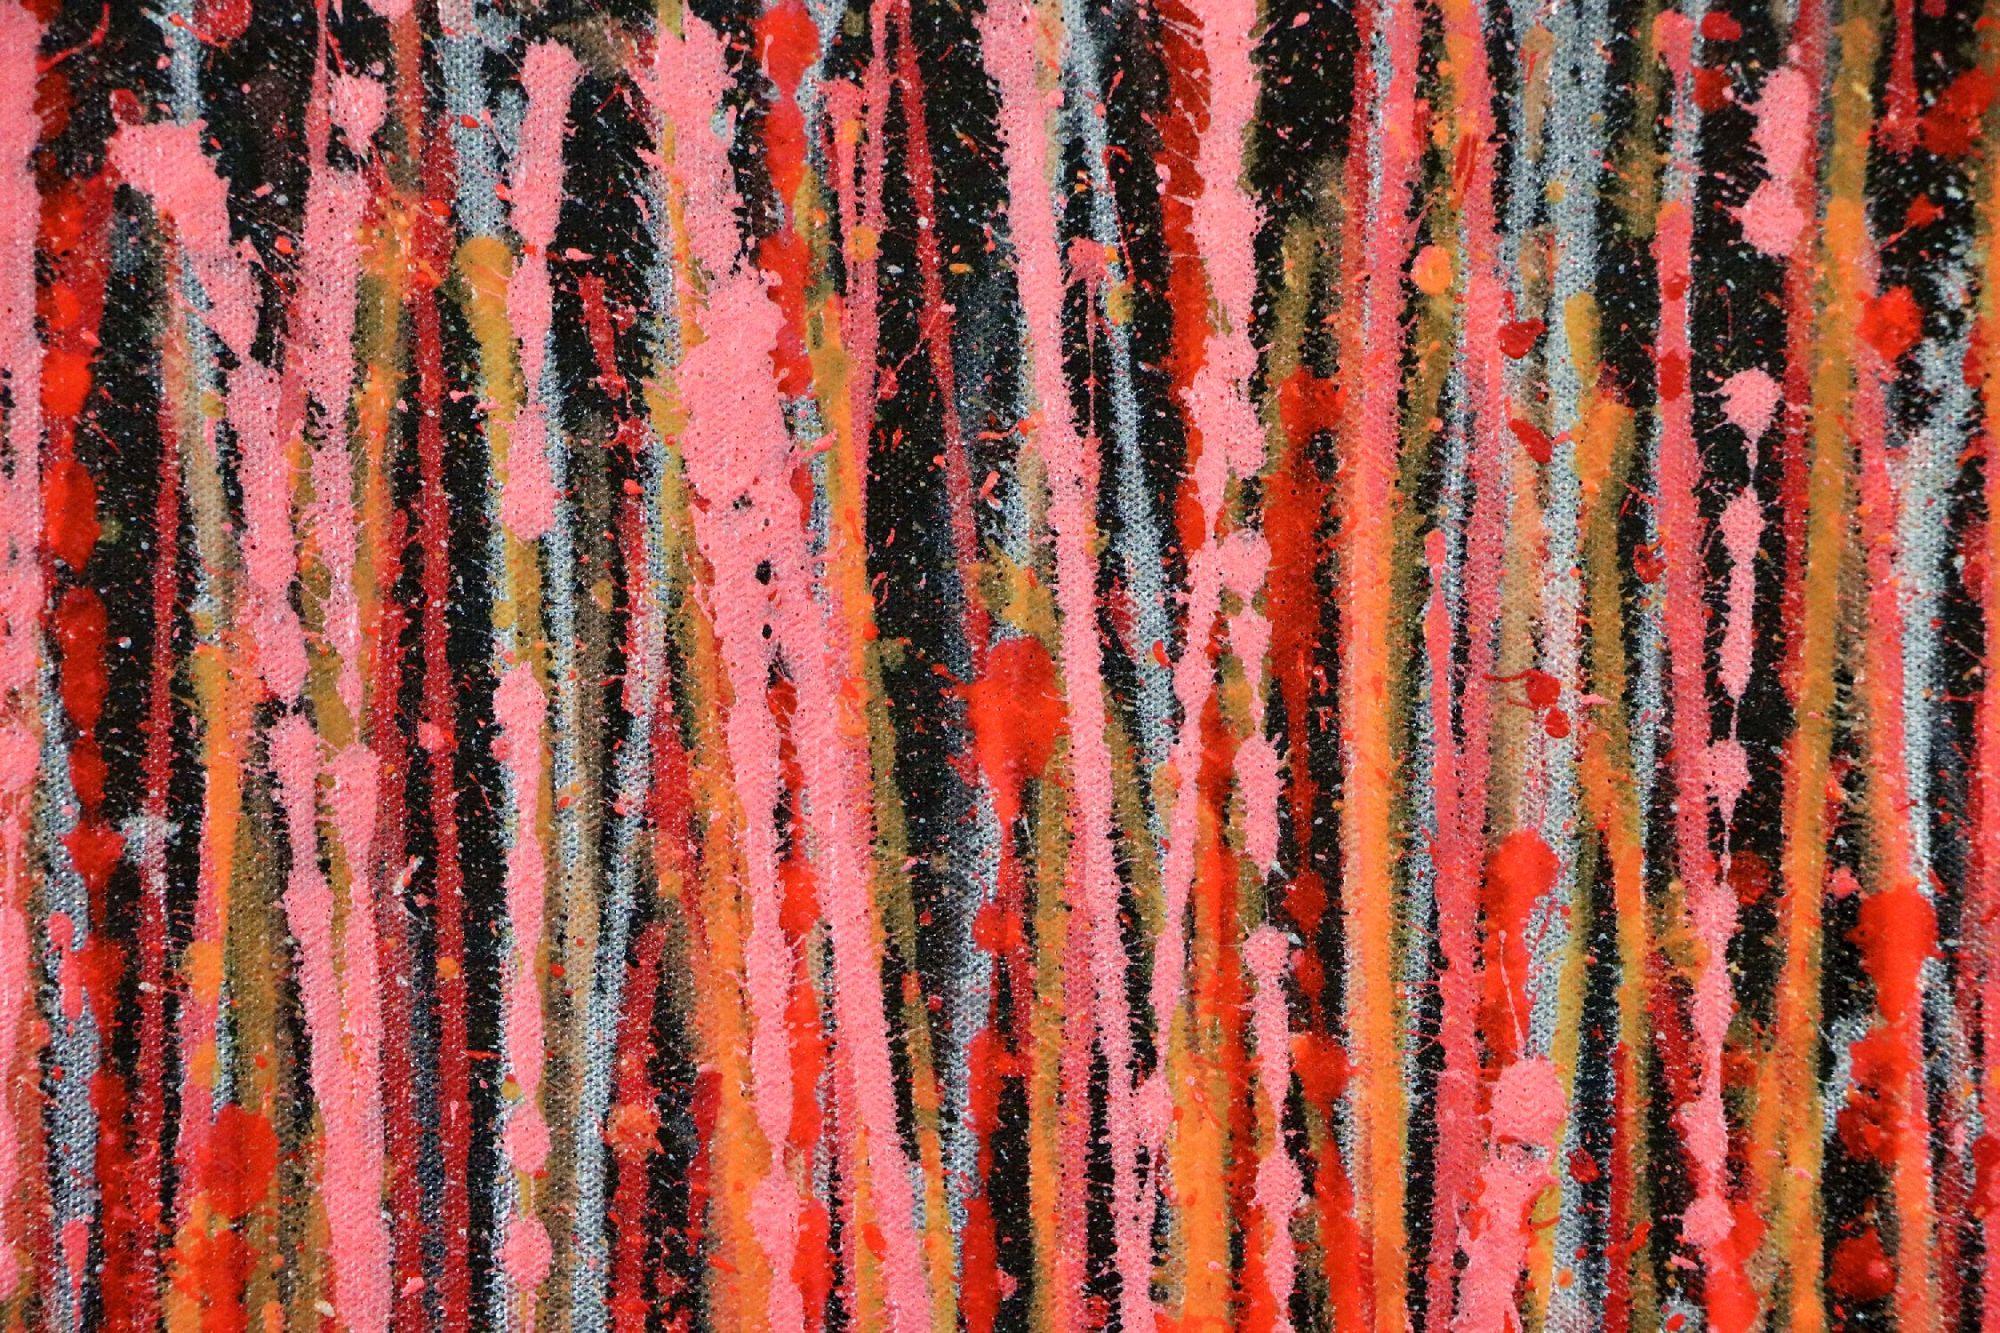 SOLD - Detail - Carmin Spectra ( Florescent Garden) (2020) by Nestor Toro